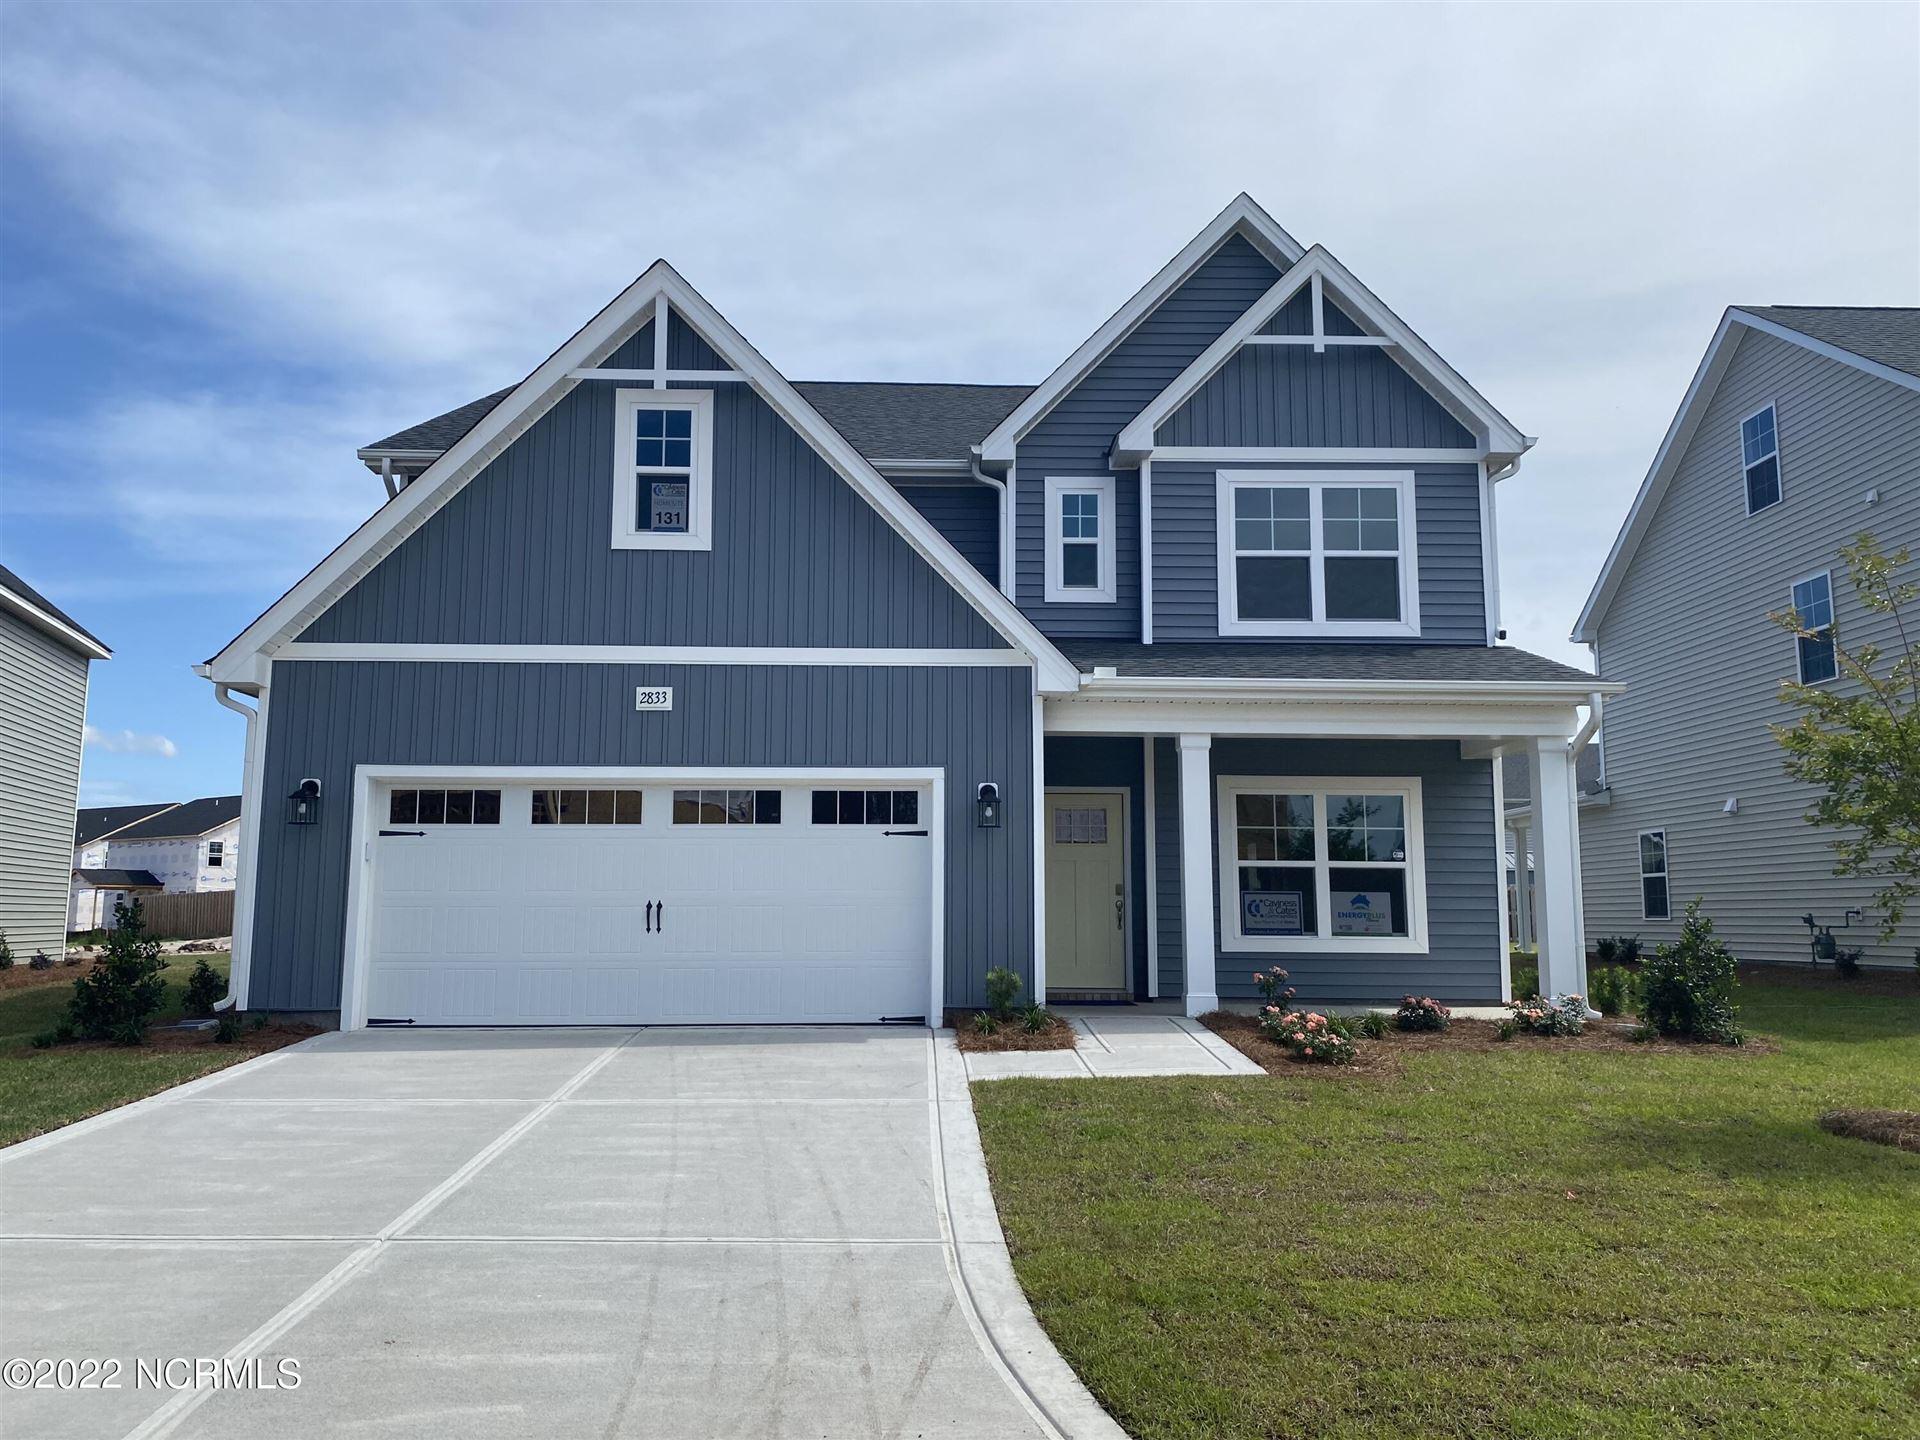 Photo of 2833 Longleaf Pine Circle, Leland, NC 28451 (MLS # 100295060)